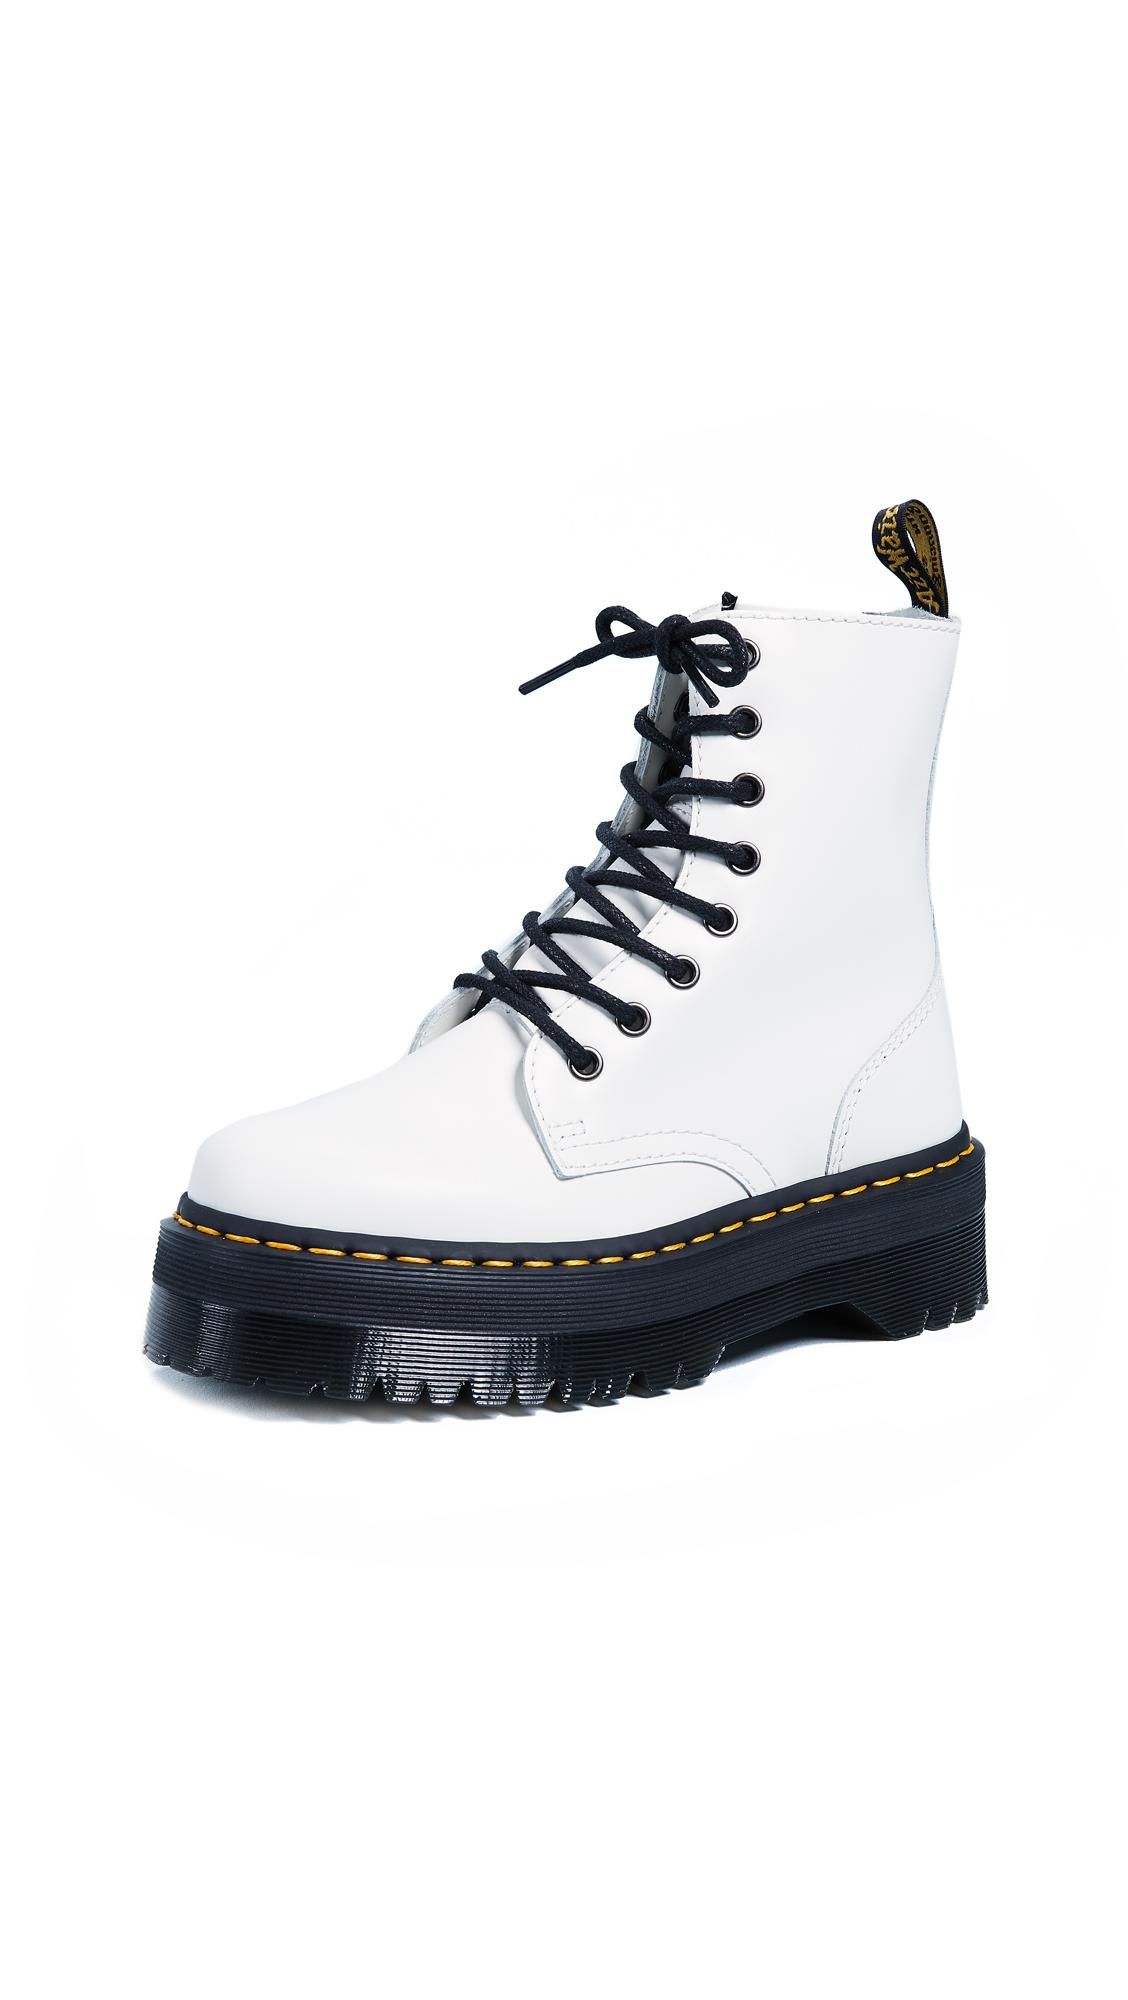 Dr. Martens Jadon 8 Eye Boots - White